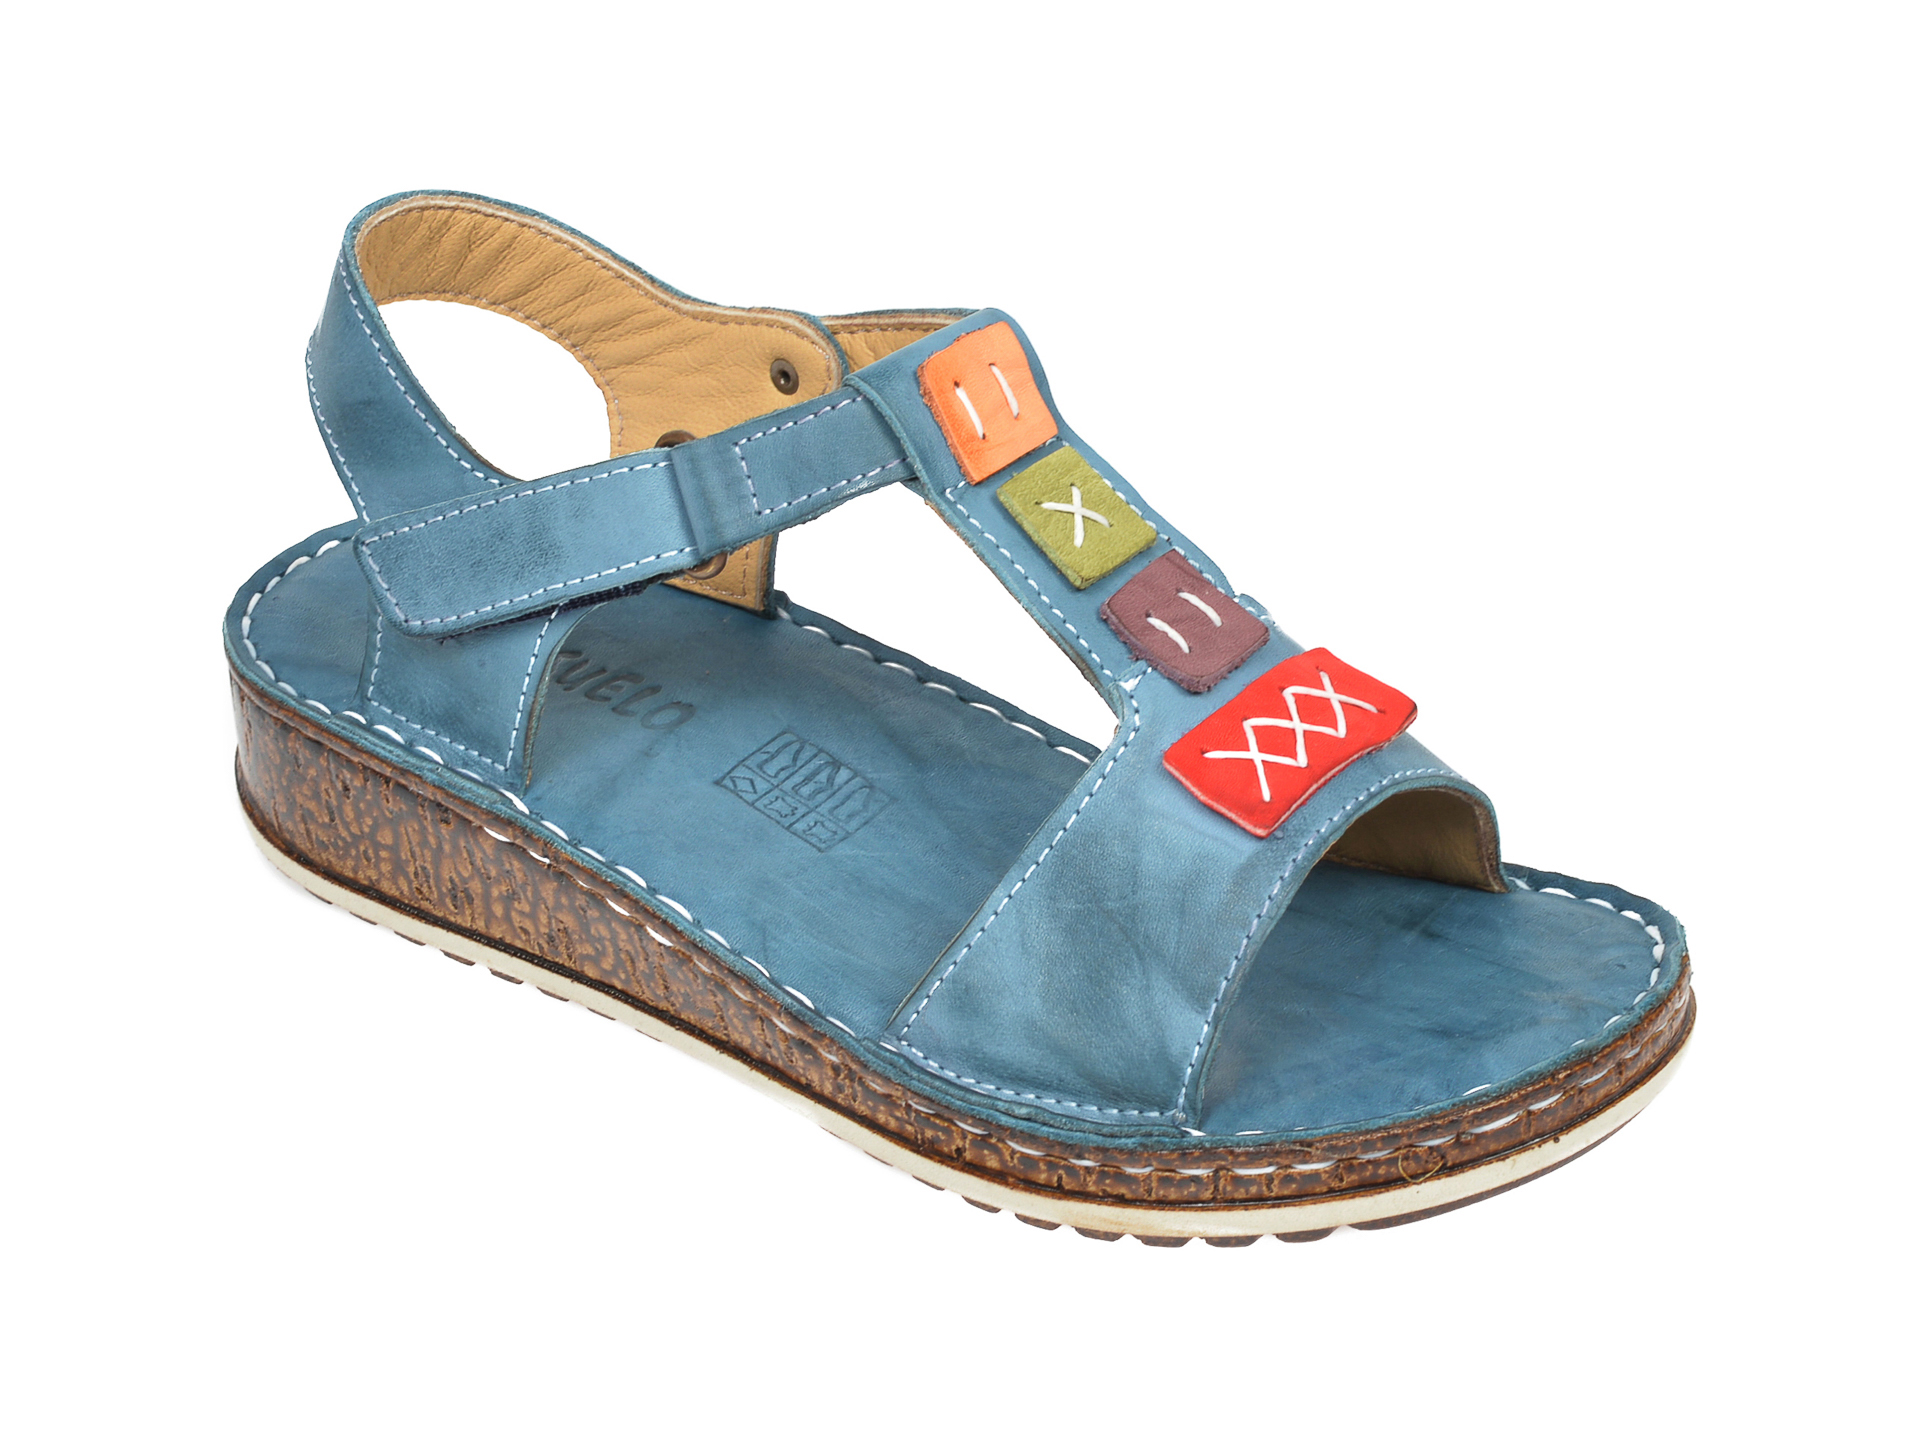 Sandale CONSUELO albastre, 1341, din piele naturala